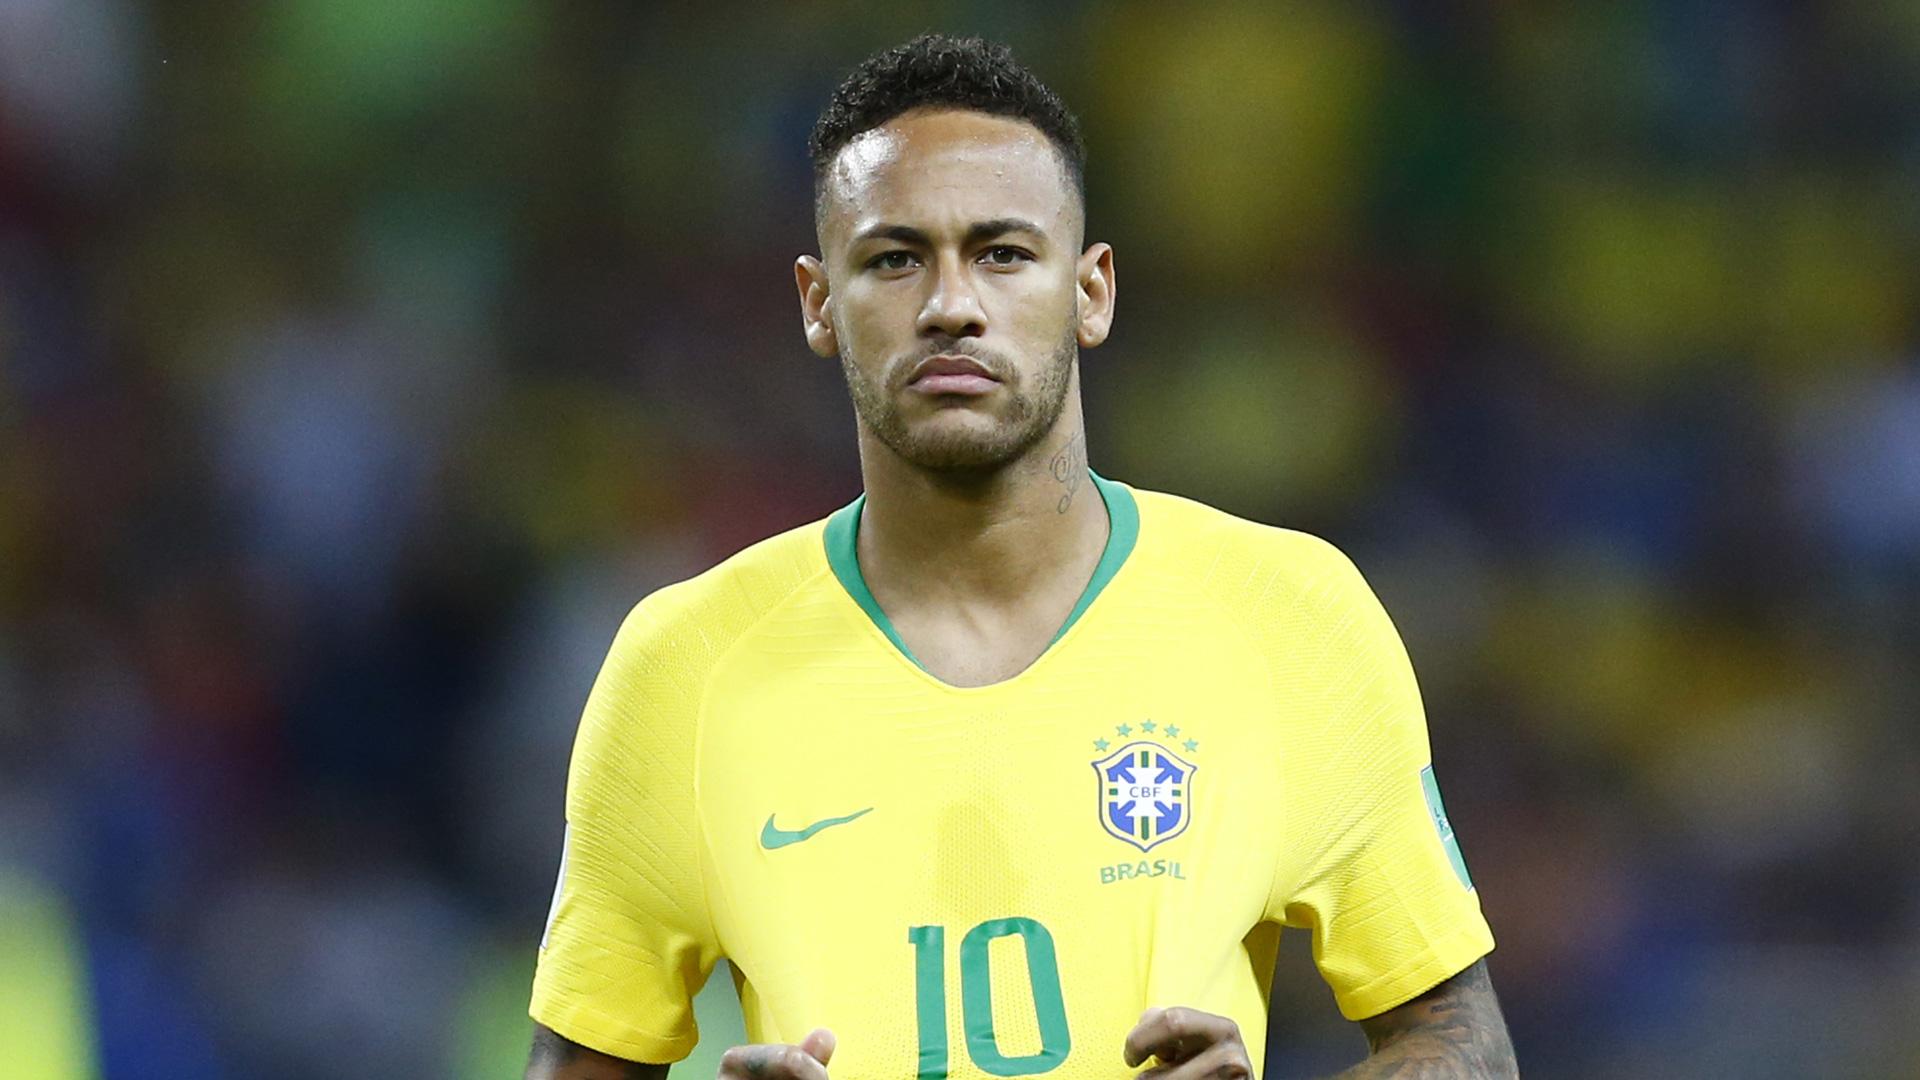 Neymar Pele Kaka Why Do Many Brazilian Footballers Have Just One Name Goal Com